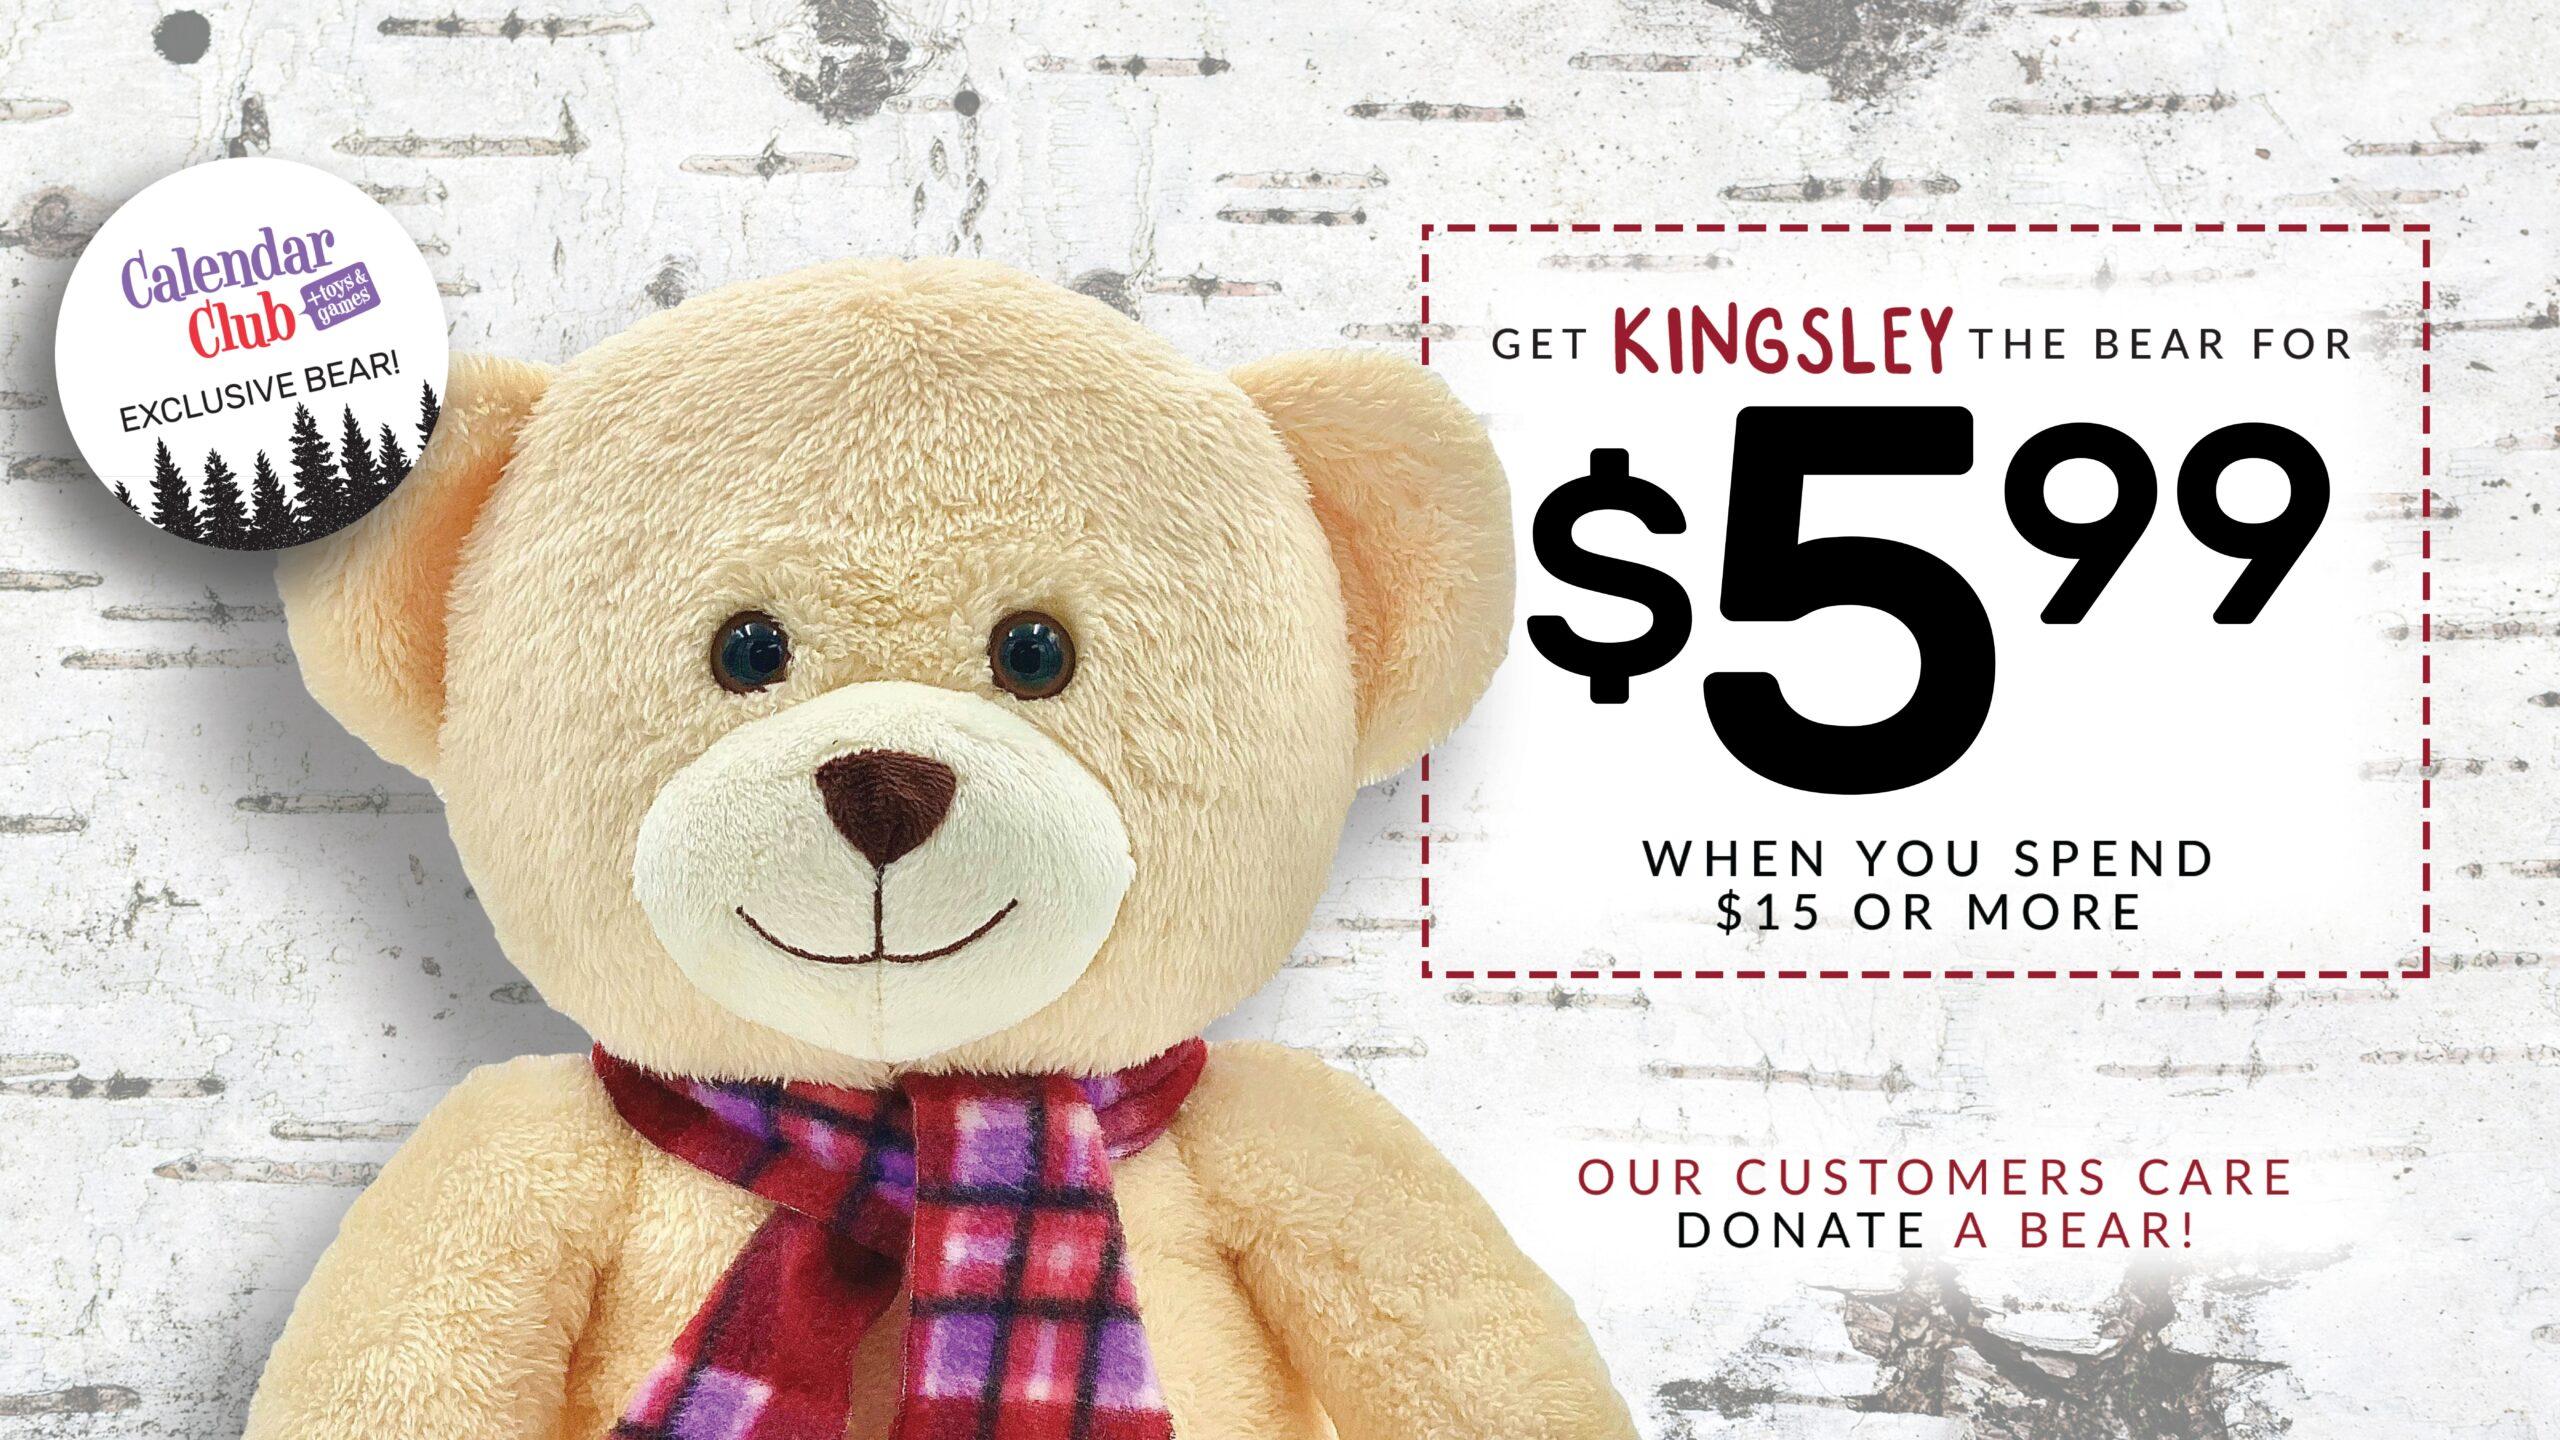 kingsley the bear